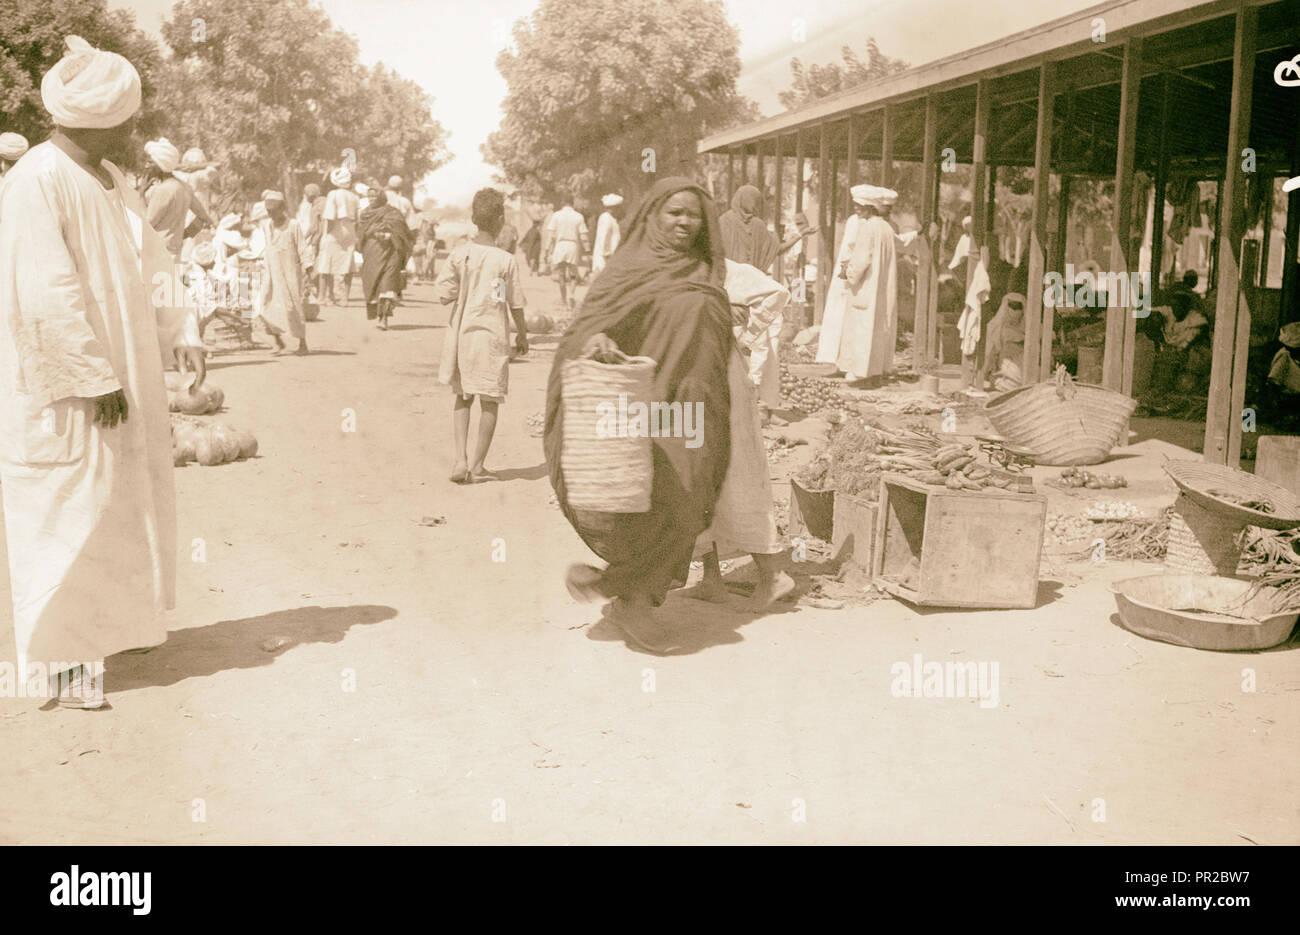 SEX AGENCY Omdurman